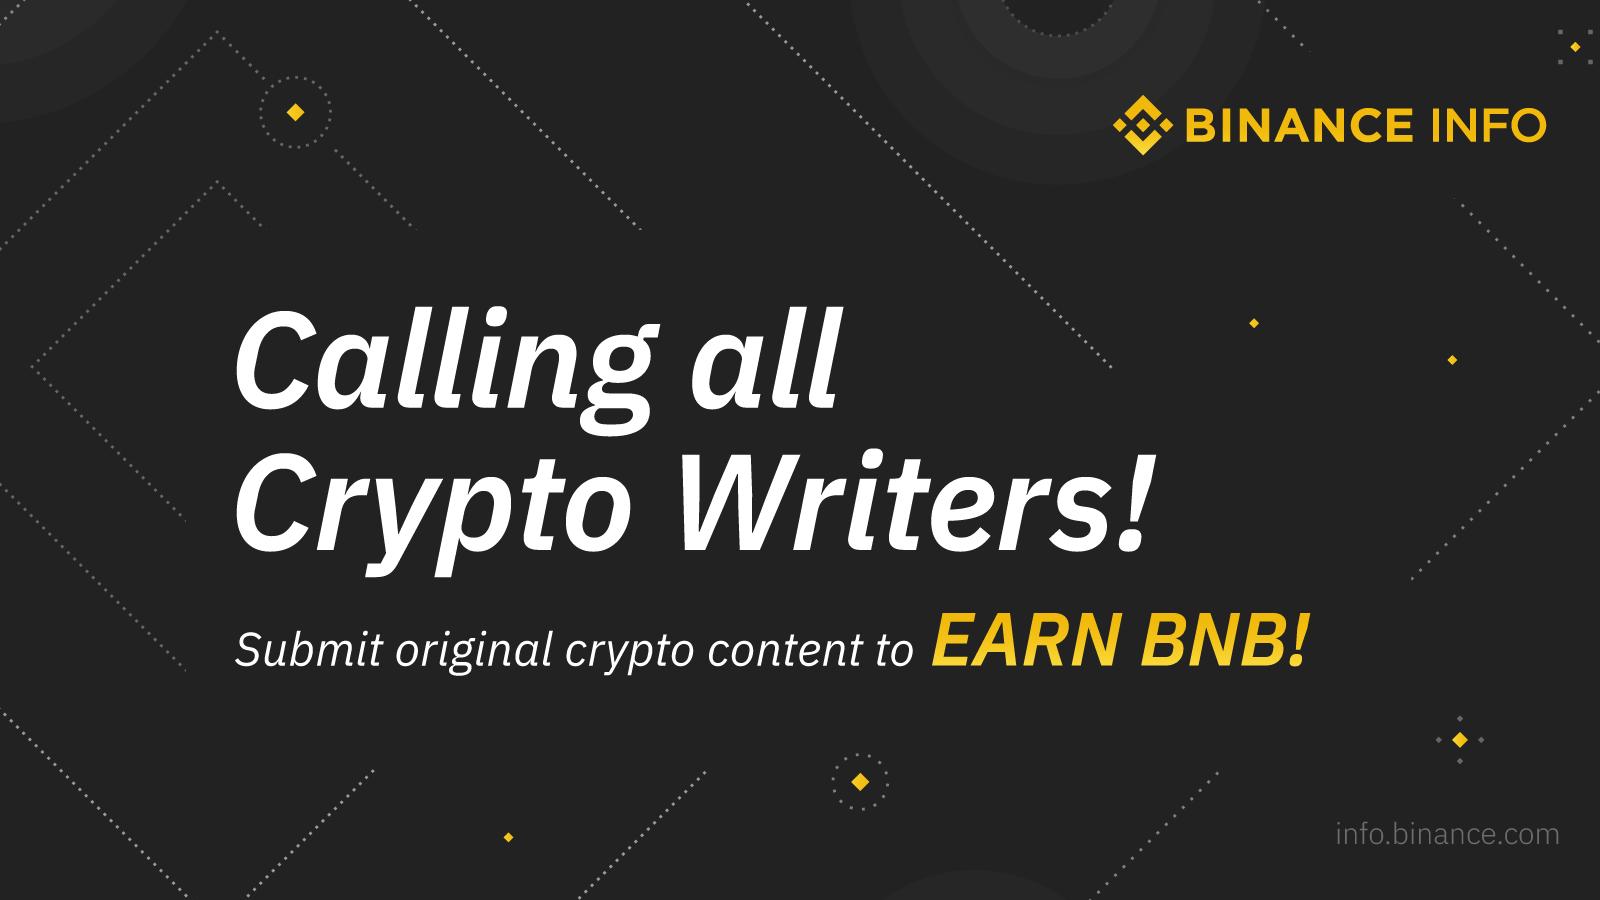 Binance Info Bounty Program: Earn BNB for Original Crypto Content